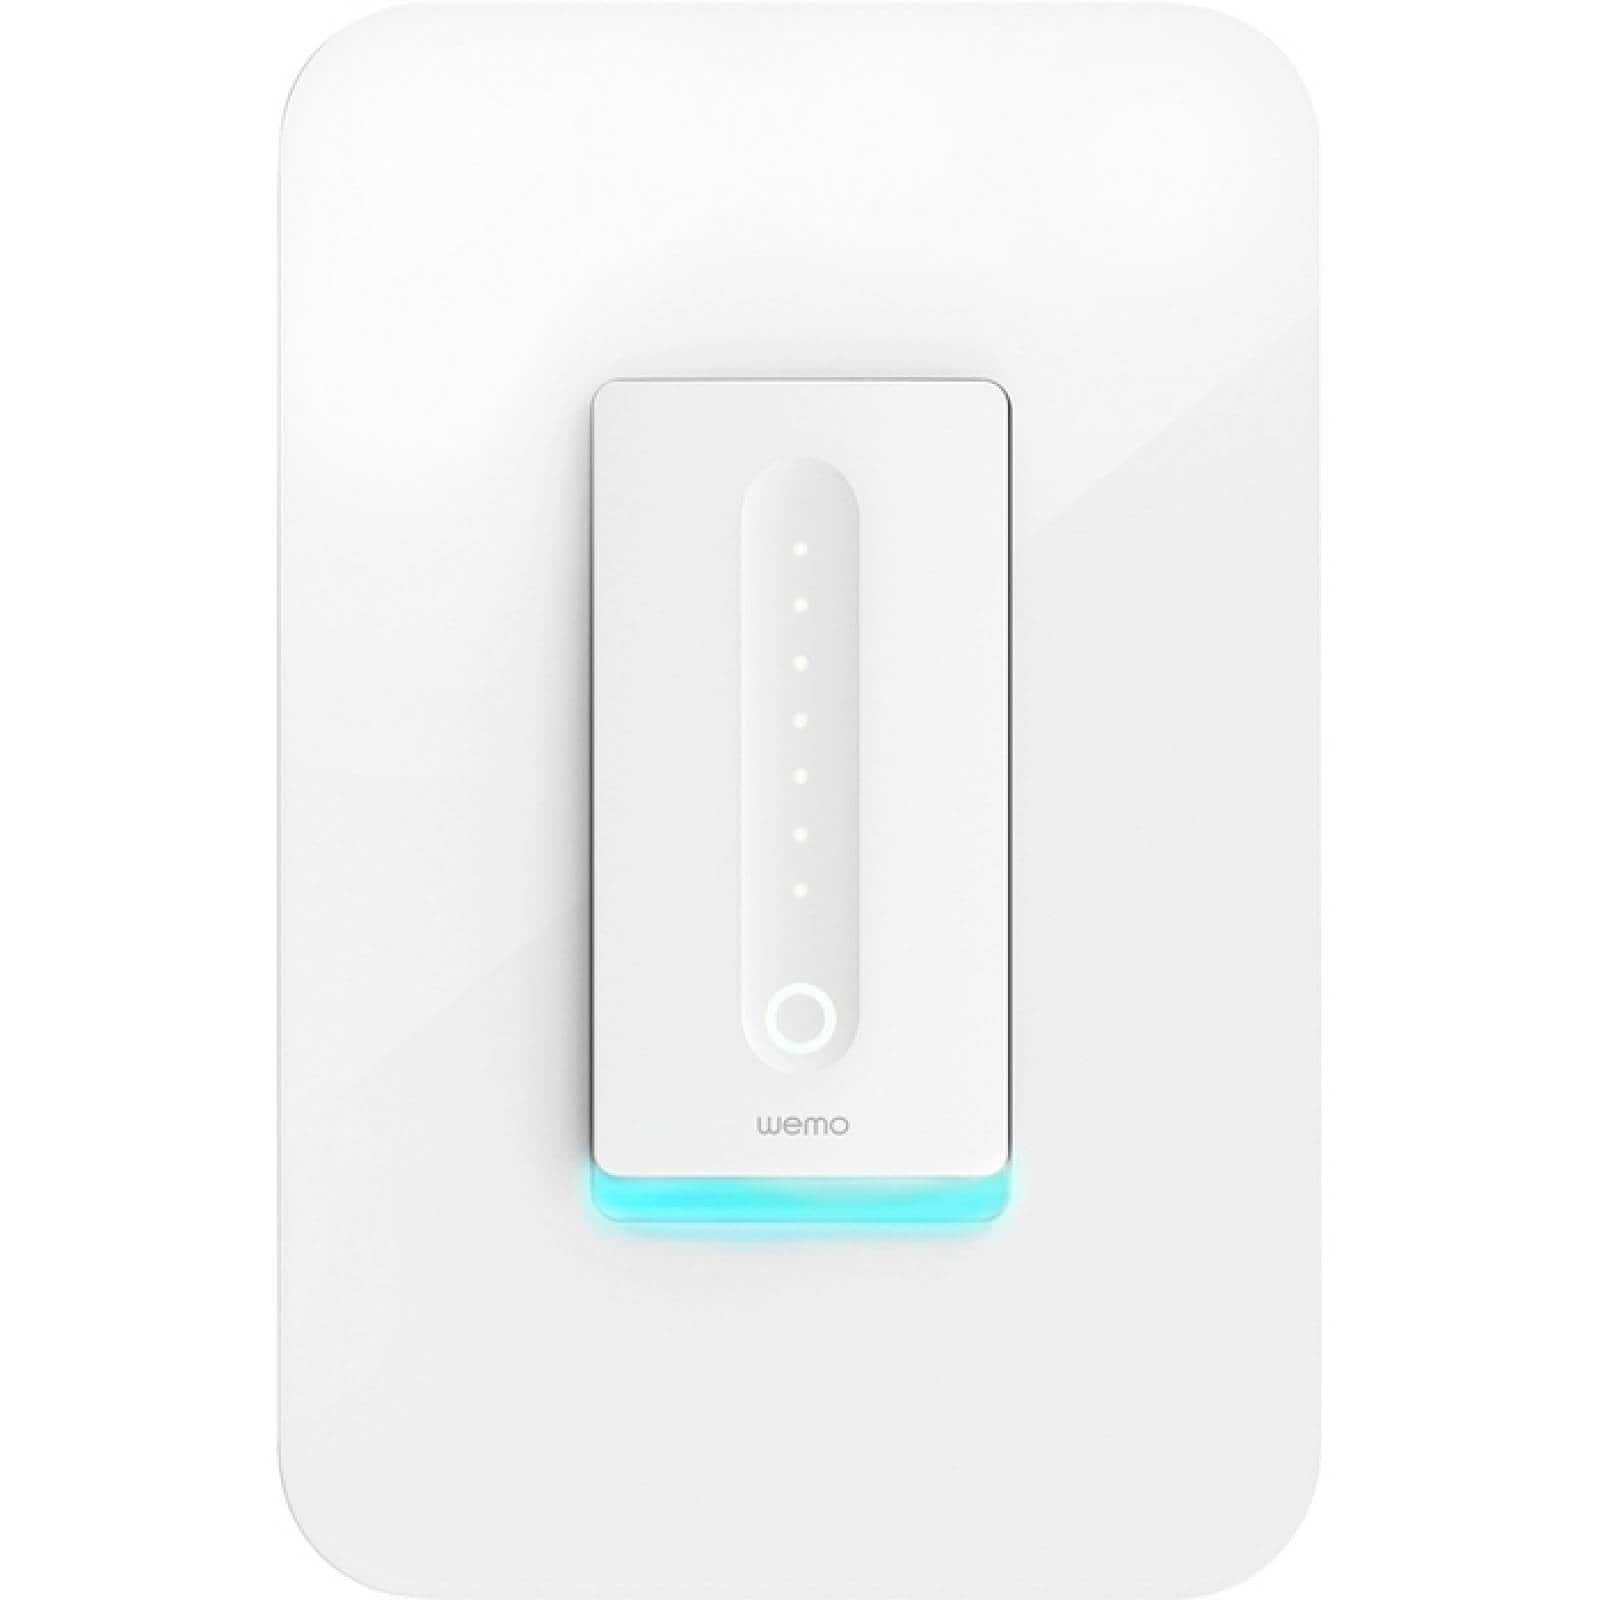 Atenuador inteligente WiFi Linksys Wemo